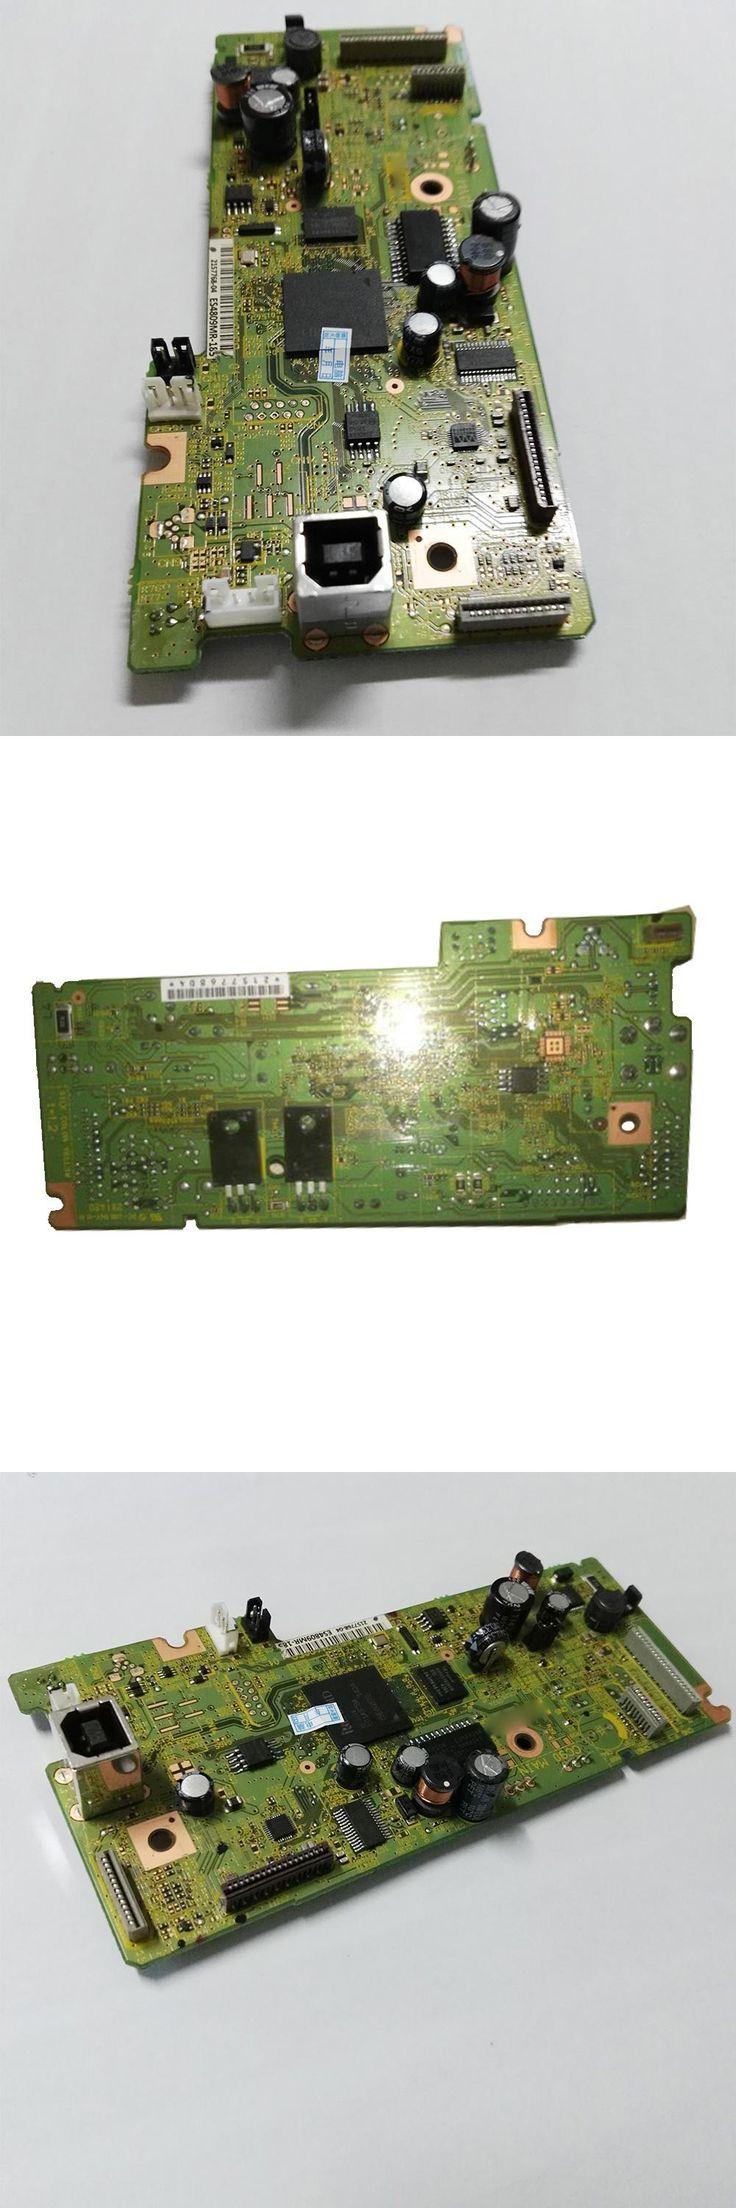 [Visit to Buy] Original Main board Mother board For Epson L365 L385 printer #Advertisement